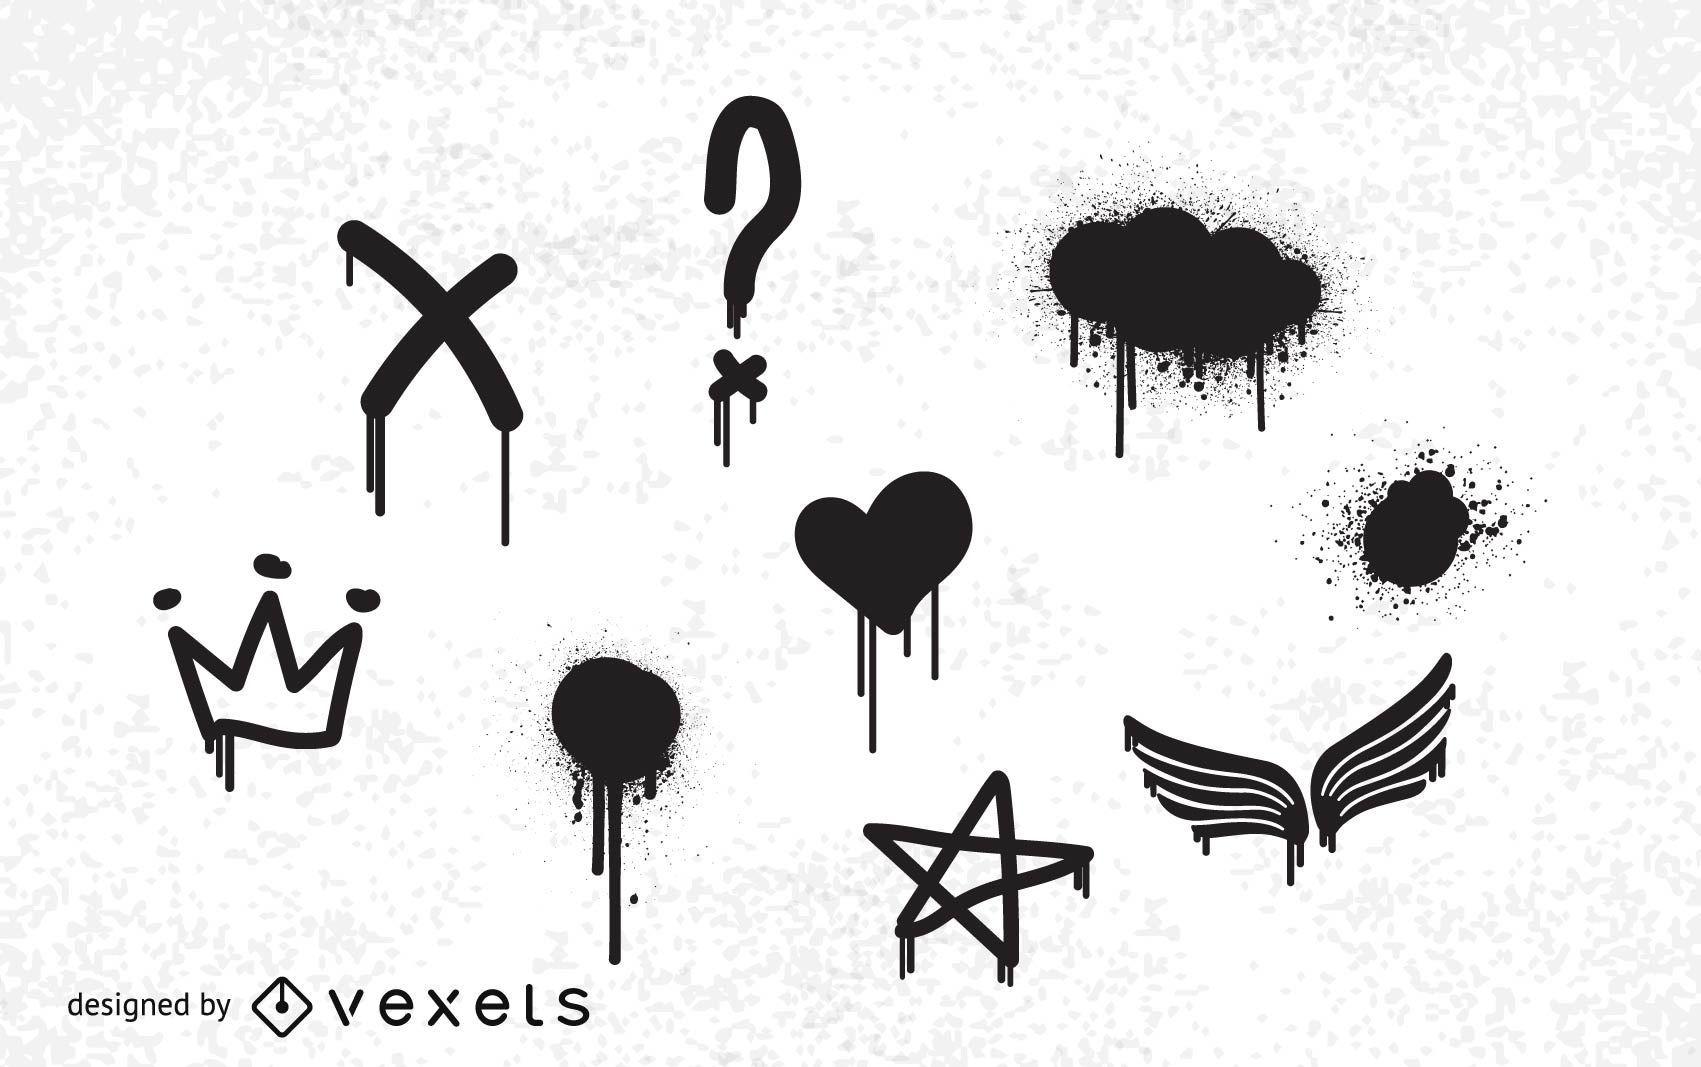 Pack de vectores gratis de graffiti abstracto